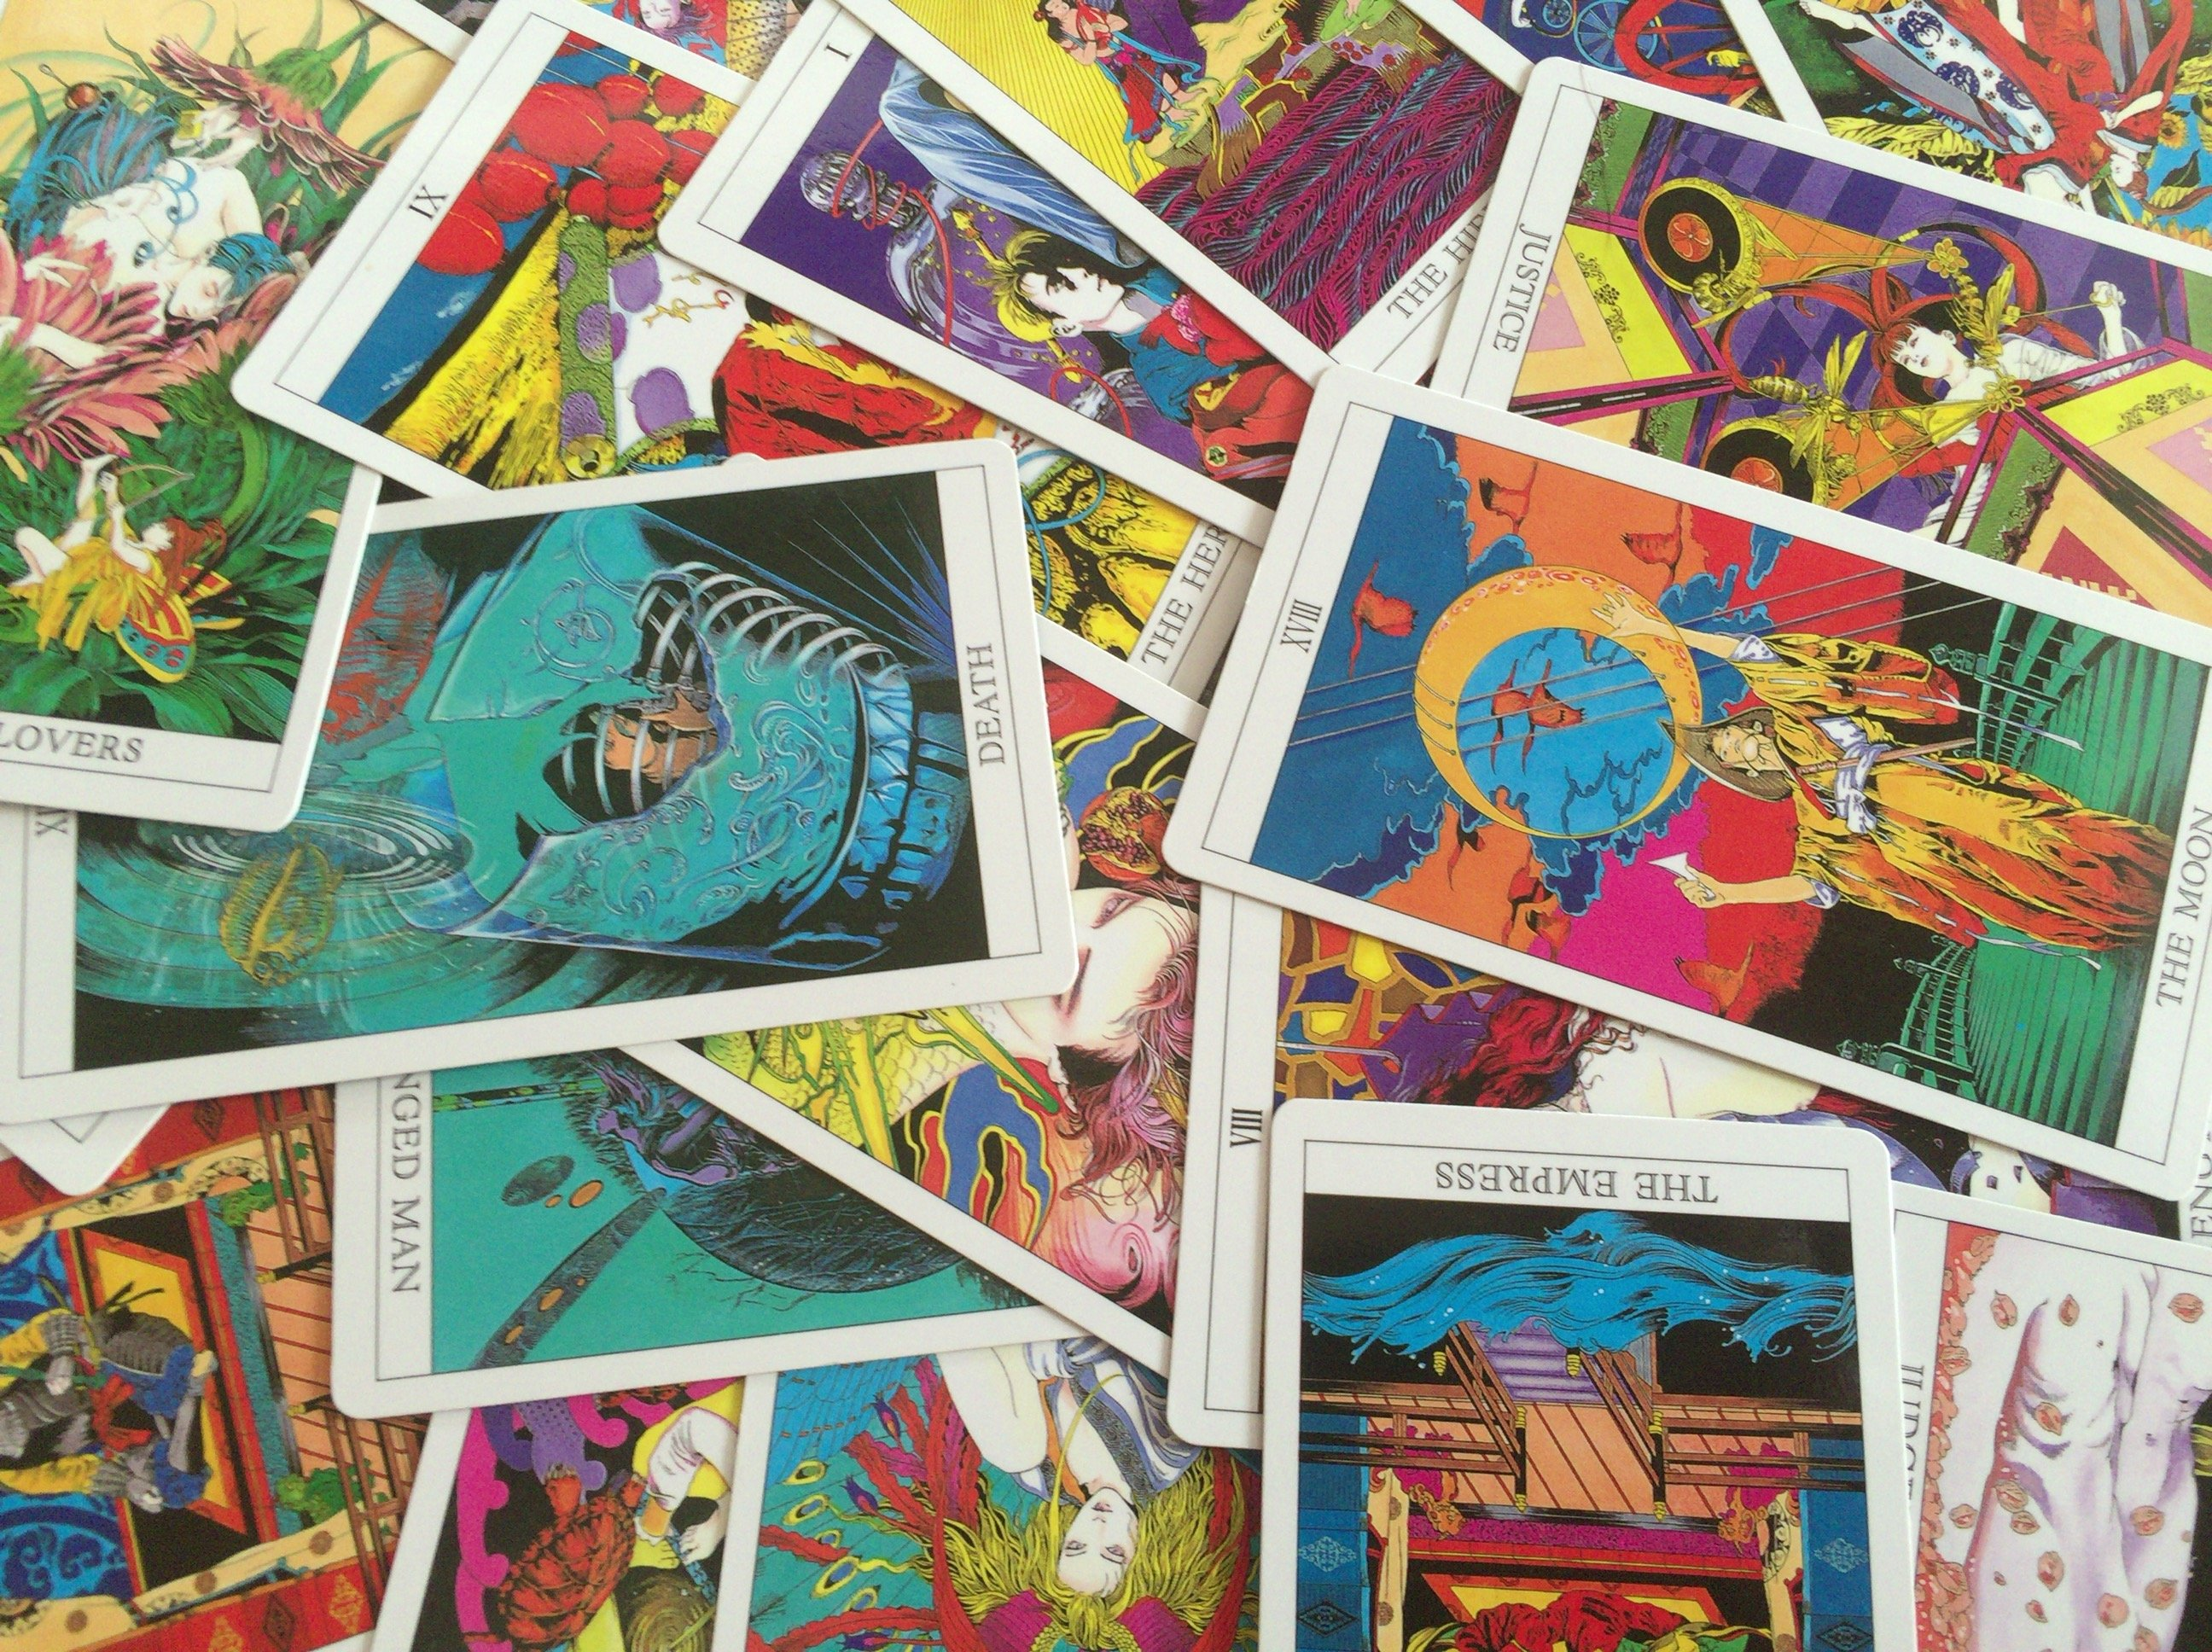 image 11.jpg?resize=300,169 - オカルトから漫画まで!作家で超常現象研究家の飛鳥昭雄ってどんな人?